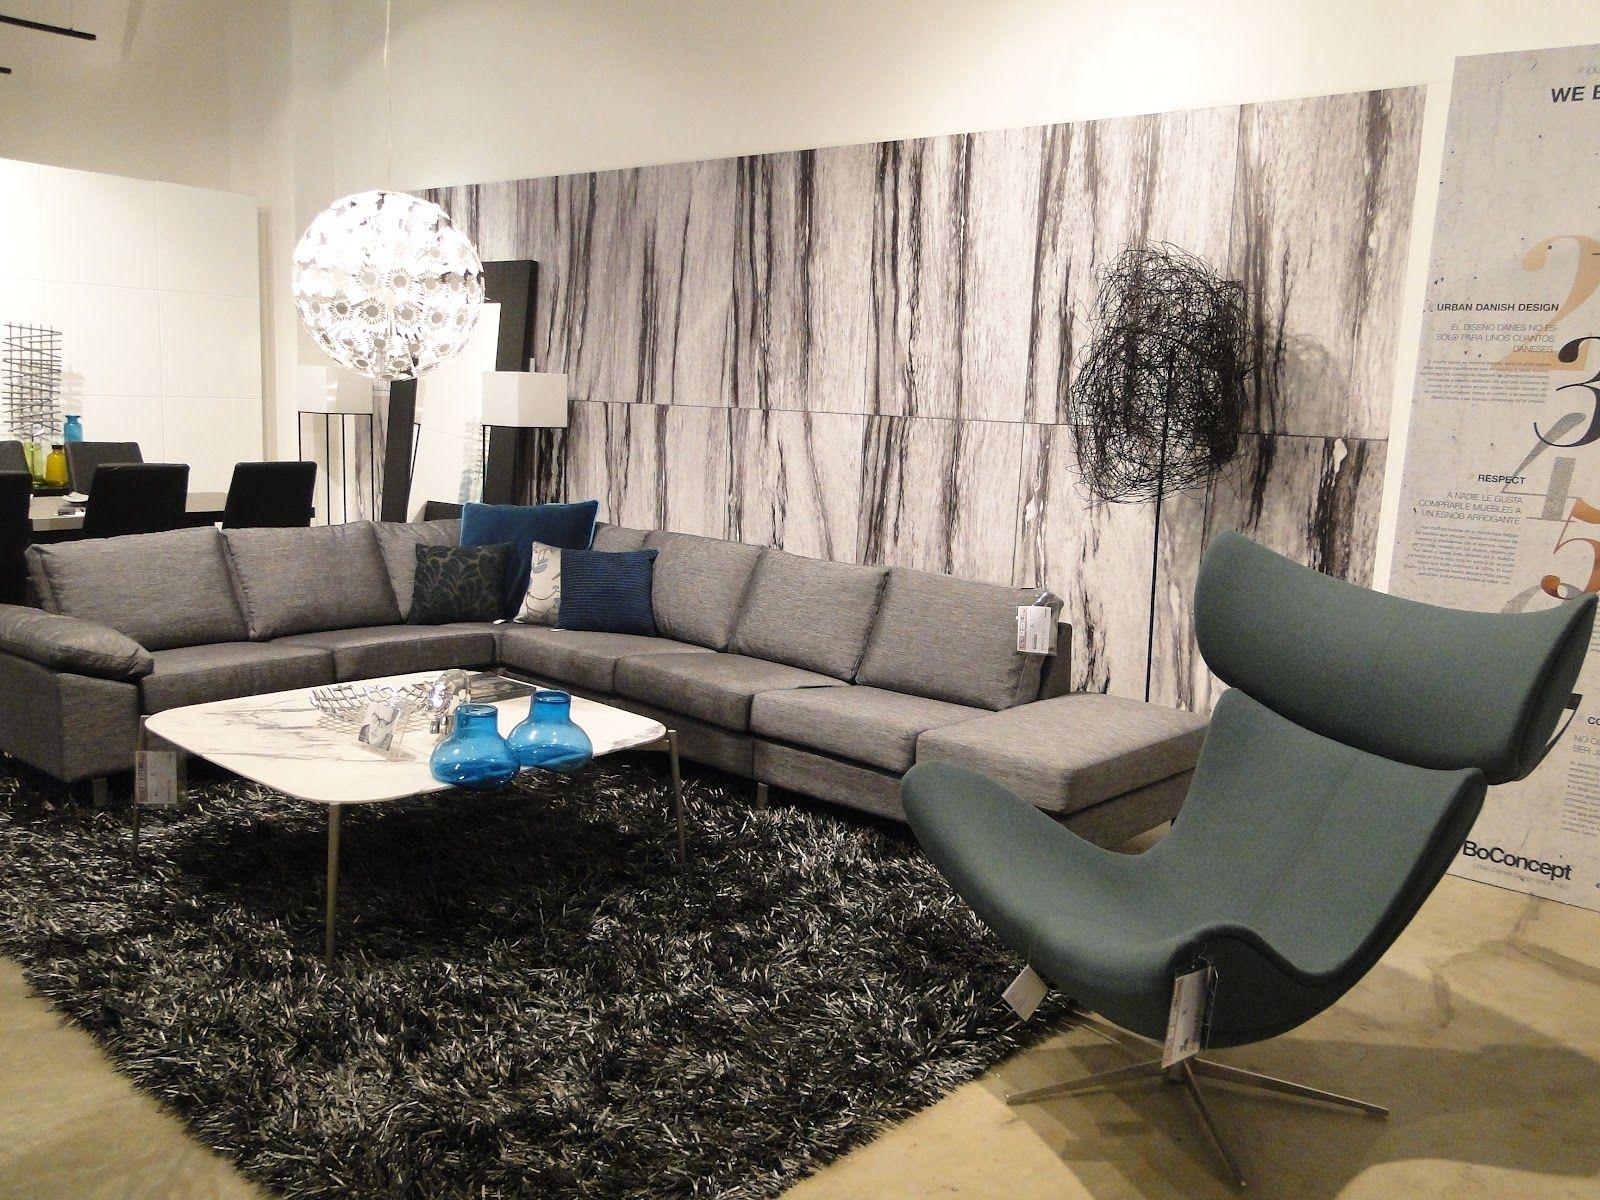 Boconcept Imola Chair Marble Coffee Table & Indivi Sofa  Design Entrancing Living Room Sofa Design 2018